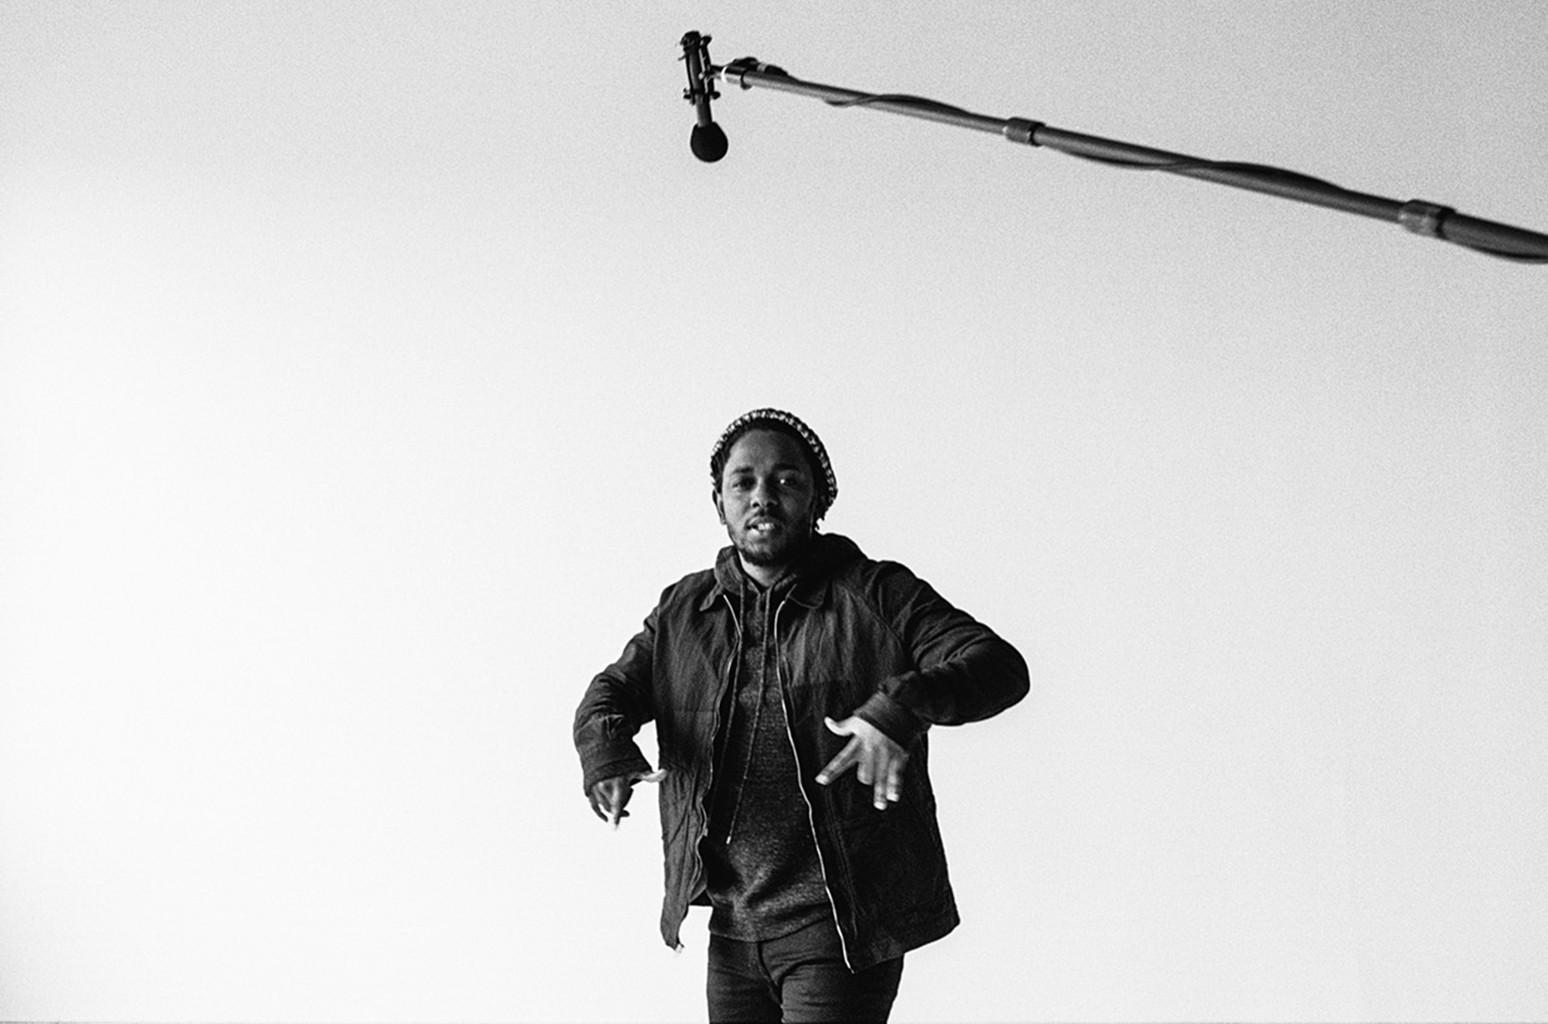 Kendrick Lamar photographed by Nabil Elderkin.